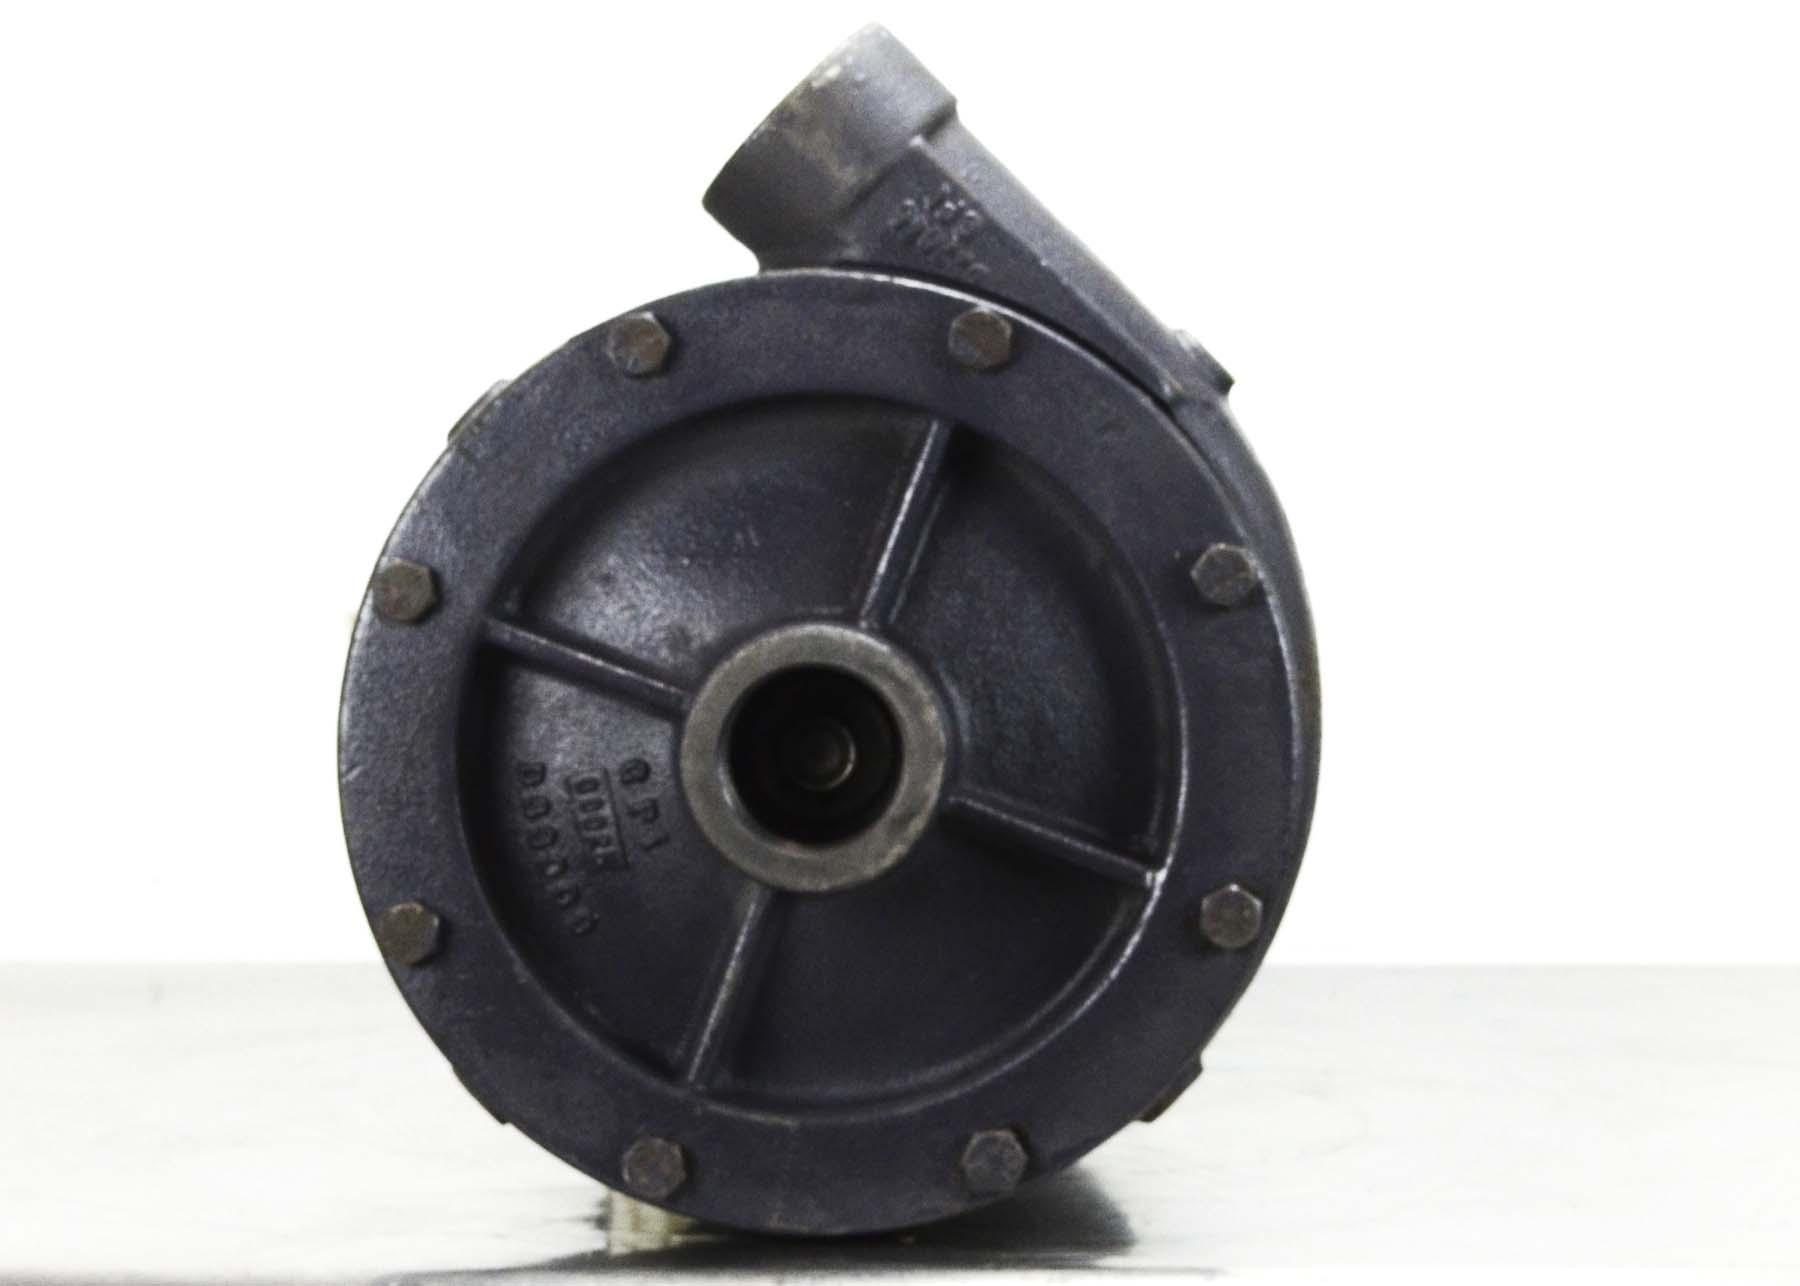 Gusher 2X2-5-10SES-C-4-CP Pump